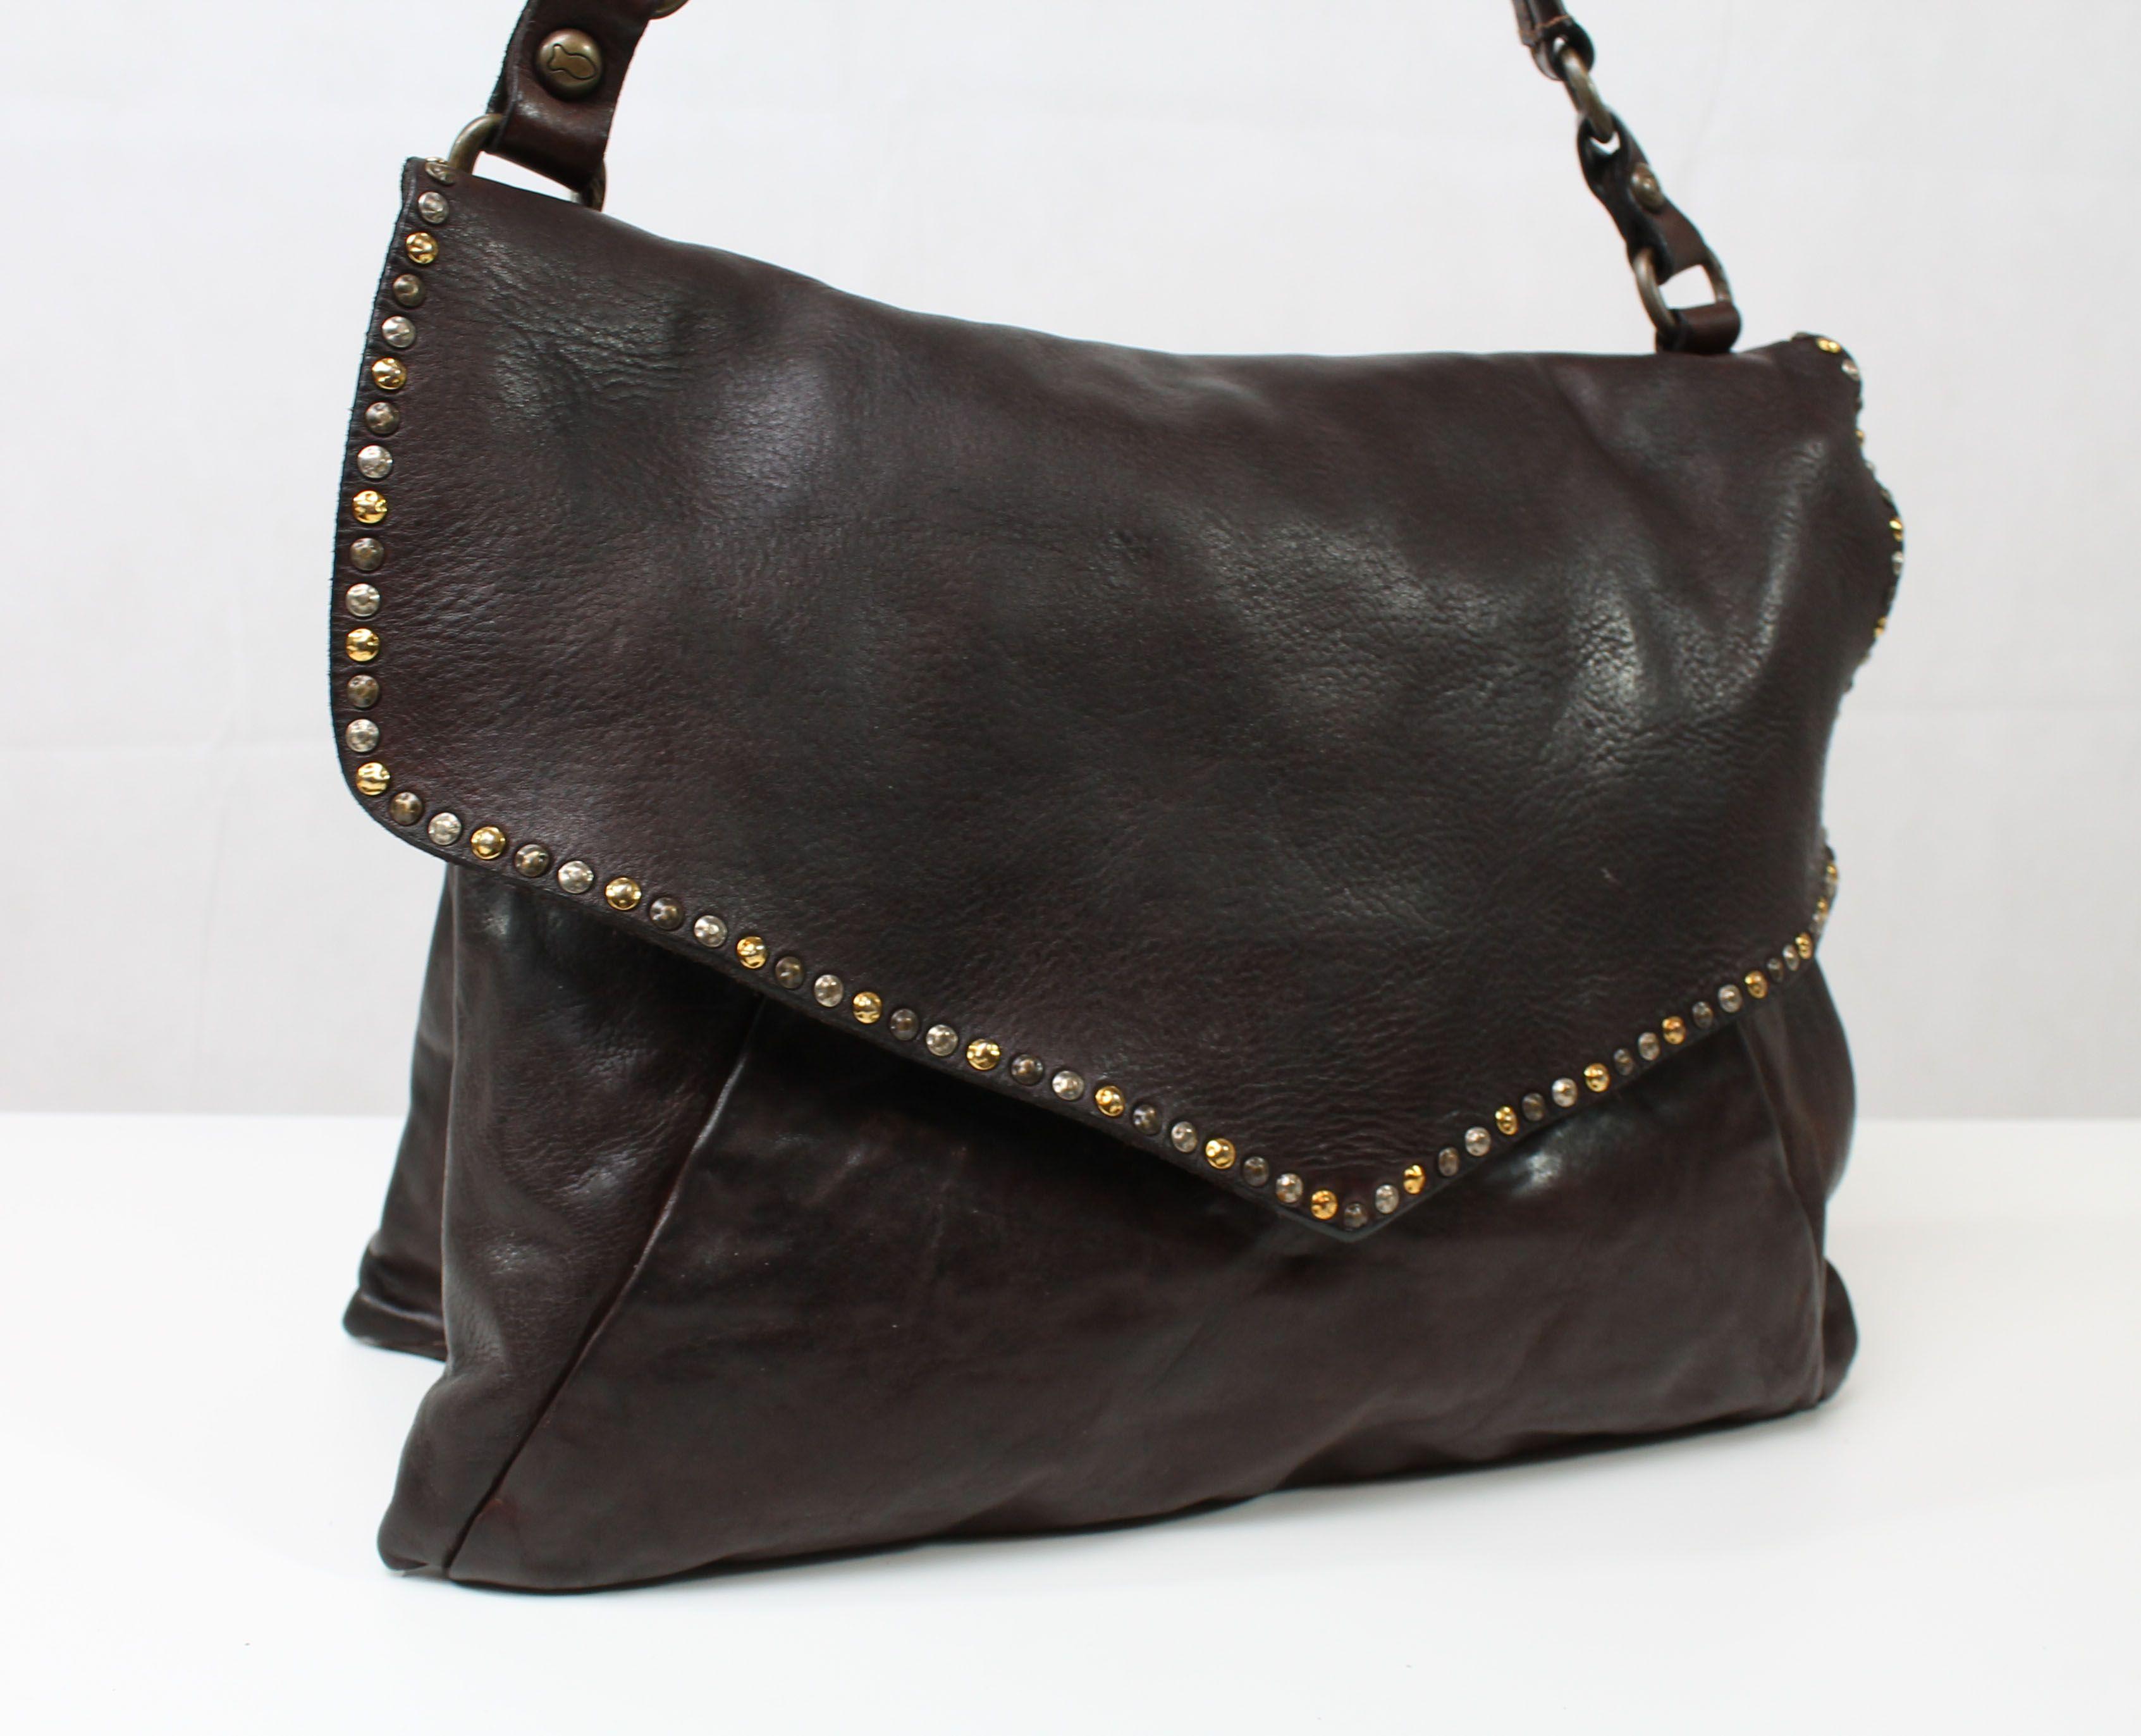 f3aef10eee8 C4004 vl Dark Brown Campomaggi Bag   Campomaggi Bags   Pinterest ...